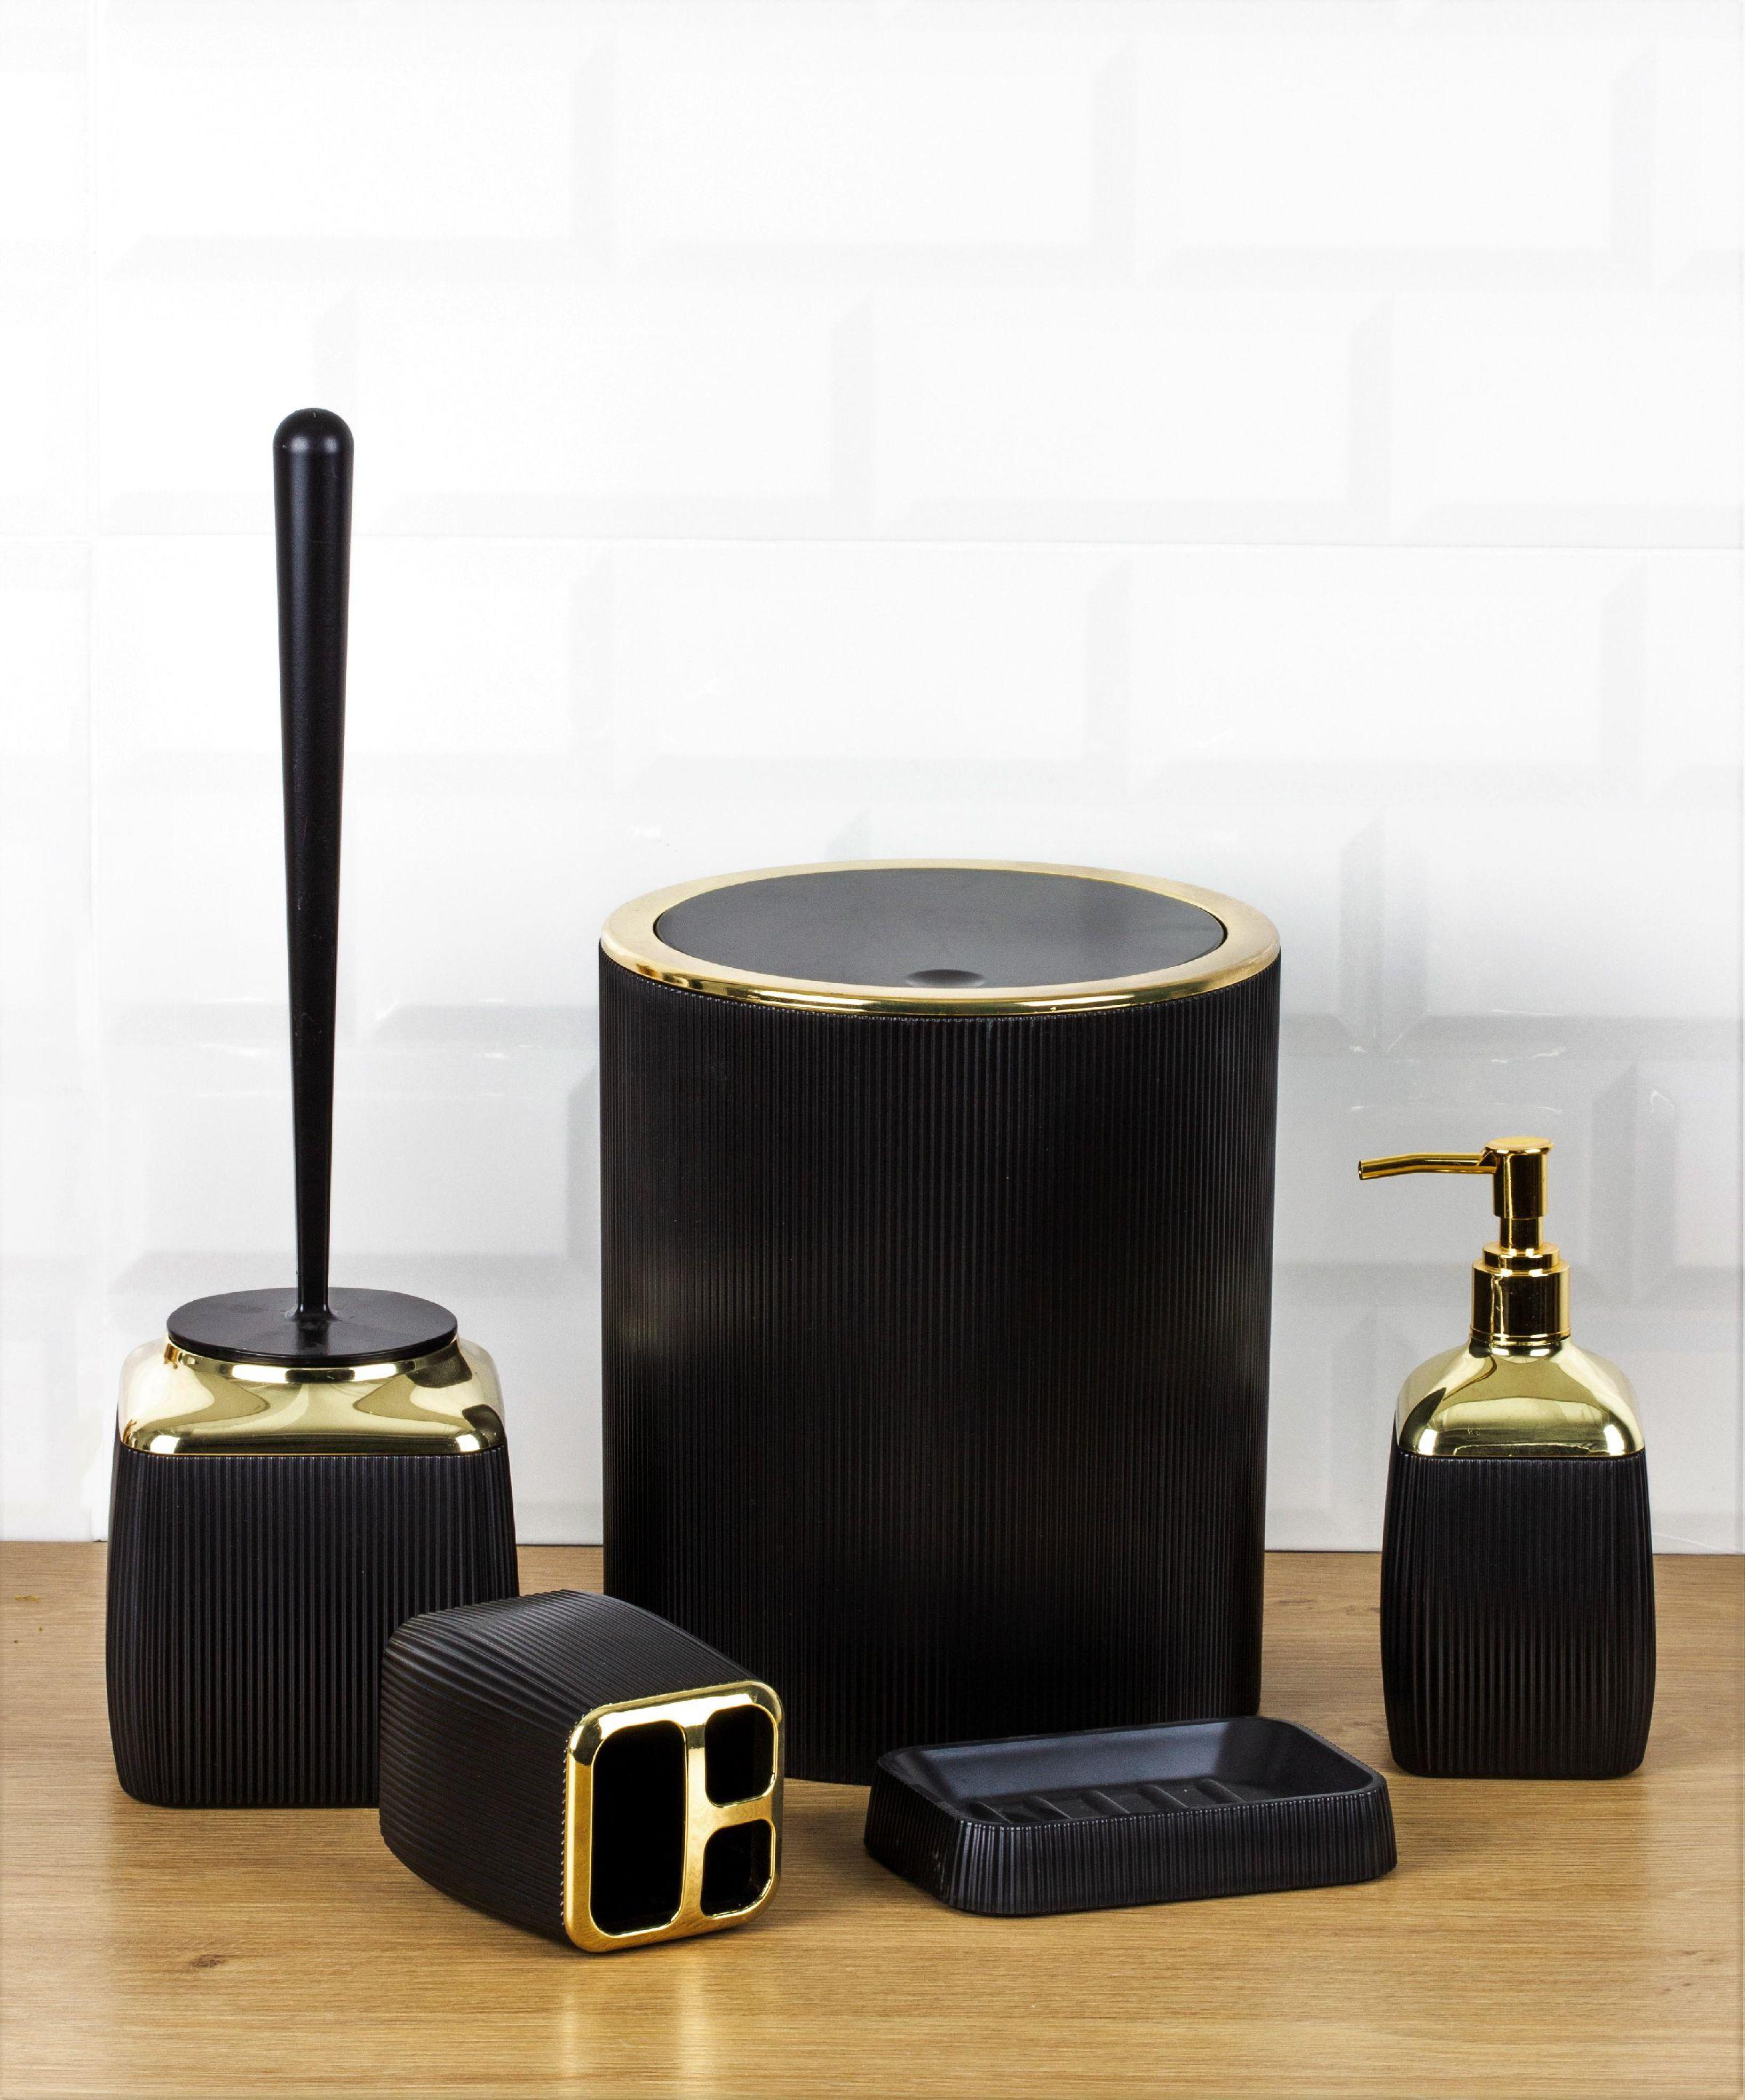 OceanLand Gold Series Striped 5 Piece Bathroom Set Hard Plastic Toothbrush Holder Soap Dispenser Toilet Brush Dustbin enlarge